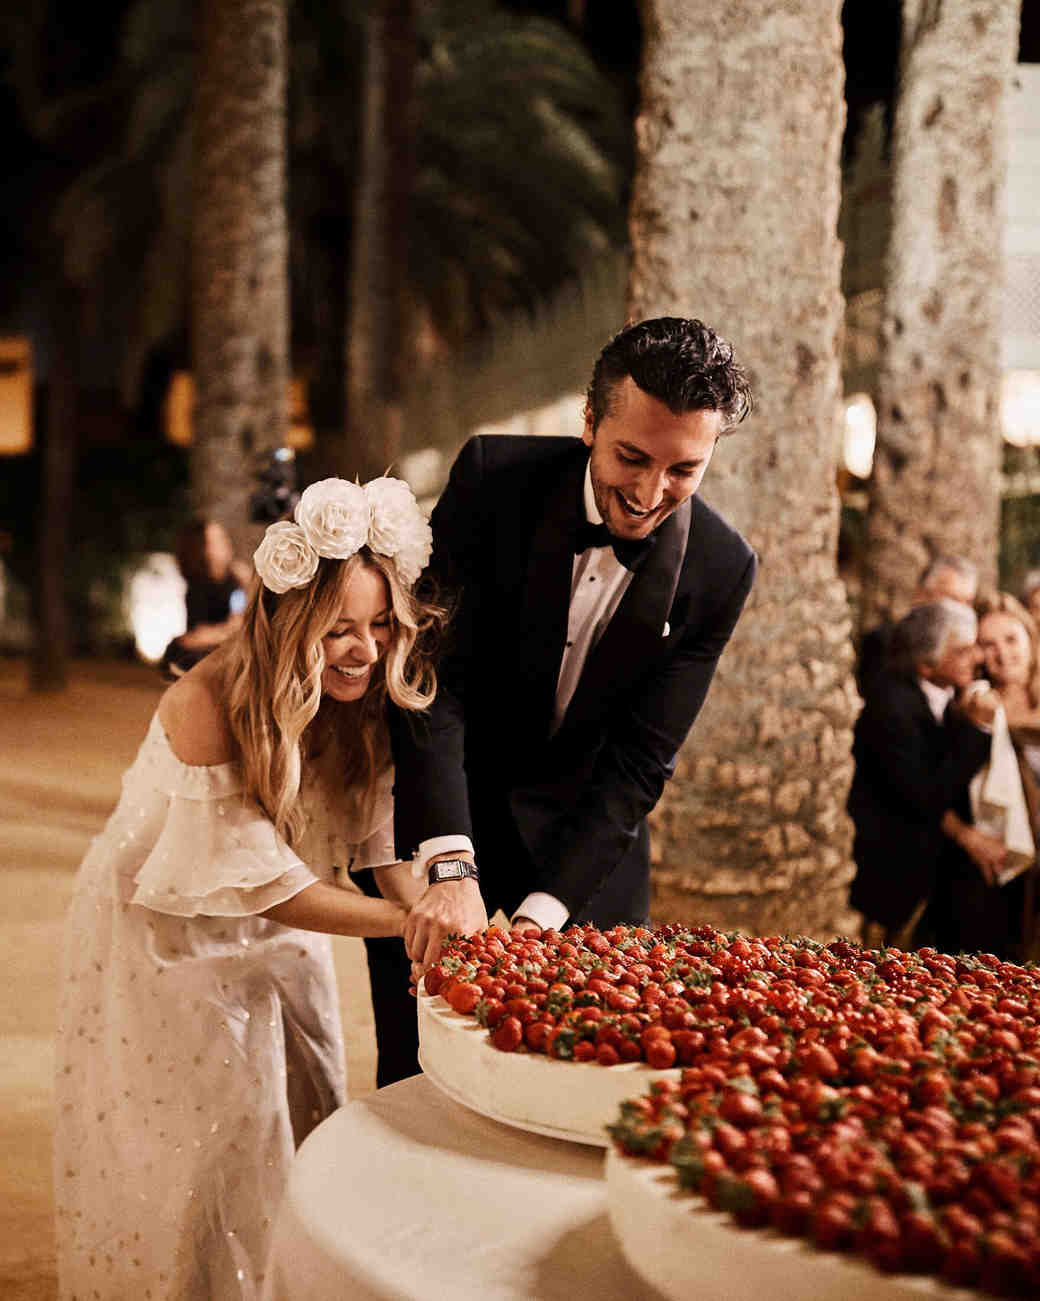 karolina sorab wedding bride groom cutting cake with strawberries